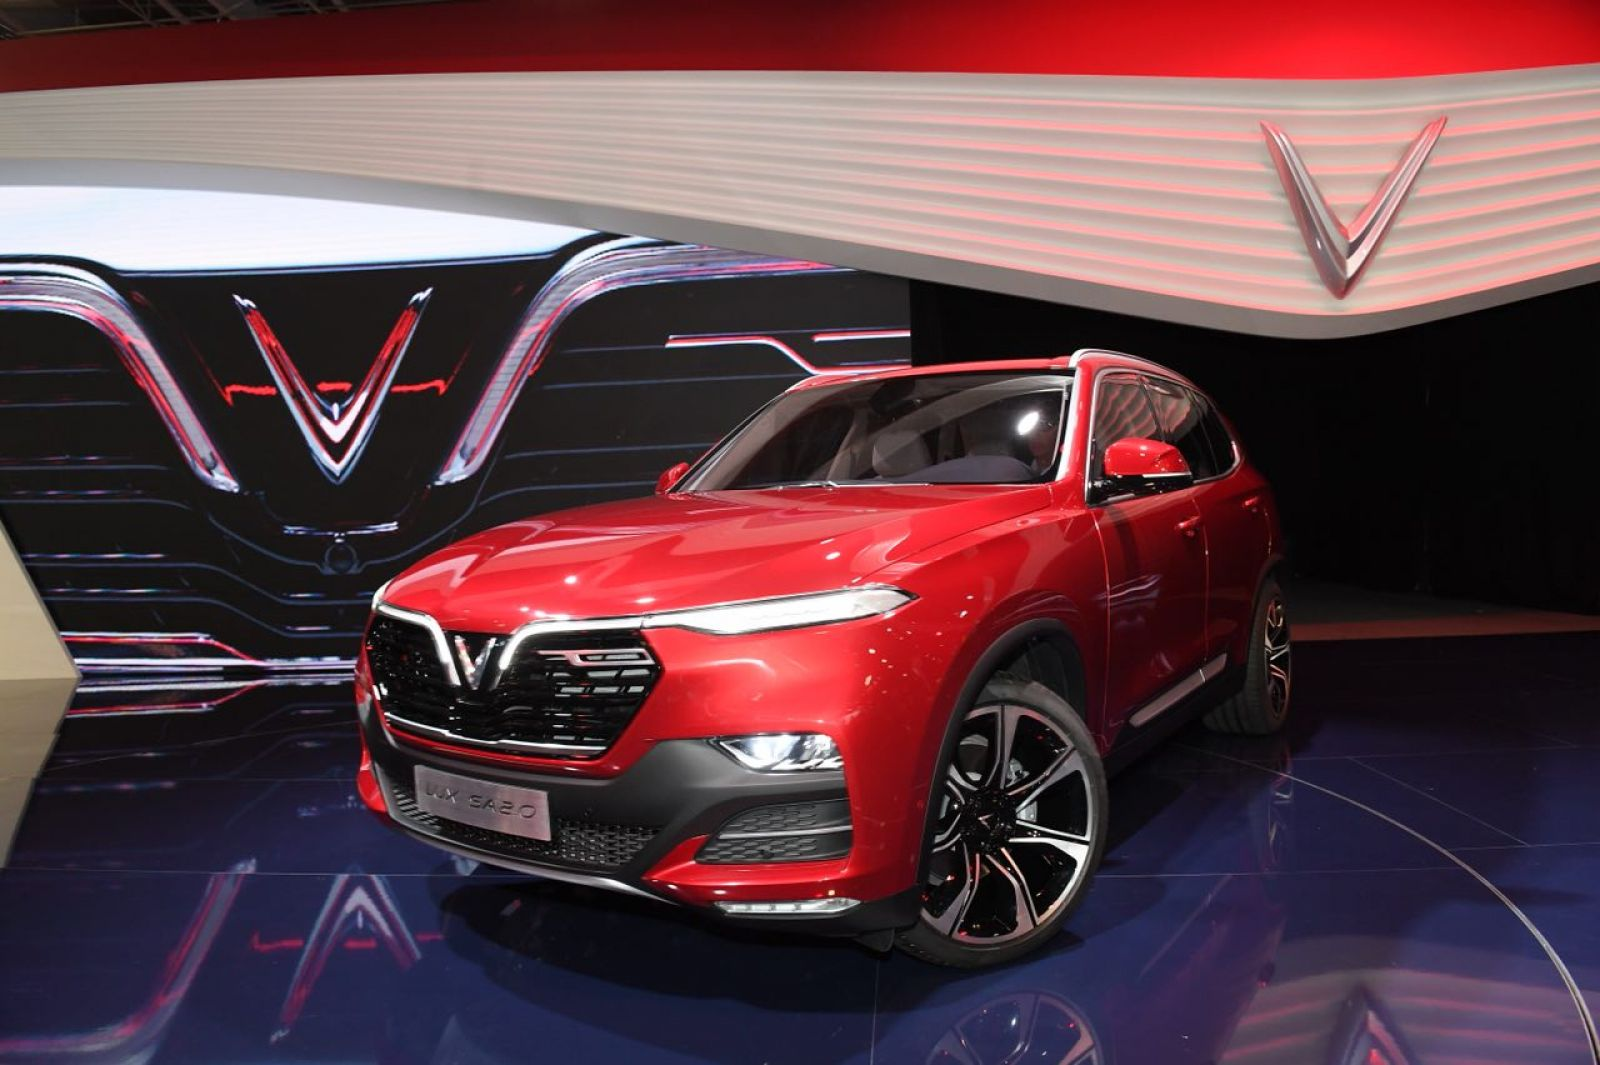 Chi tiết mẫu xe SUV VinFast Lux SA2.0 vừa ra mắt tại Paris Motor Show 2018